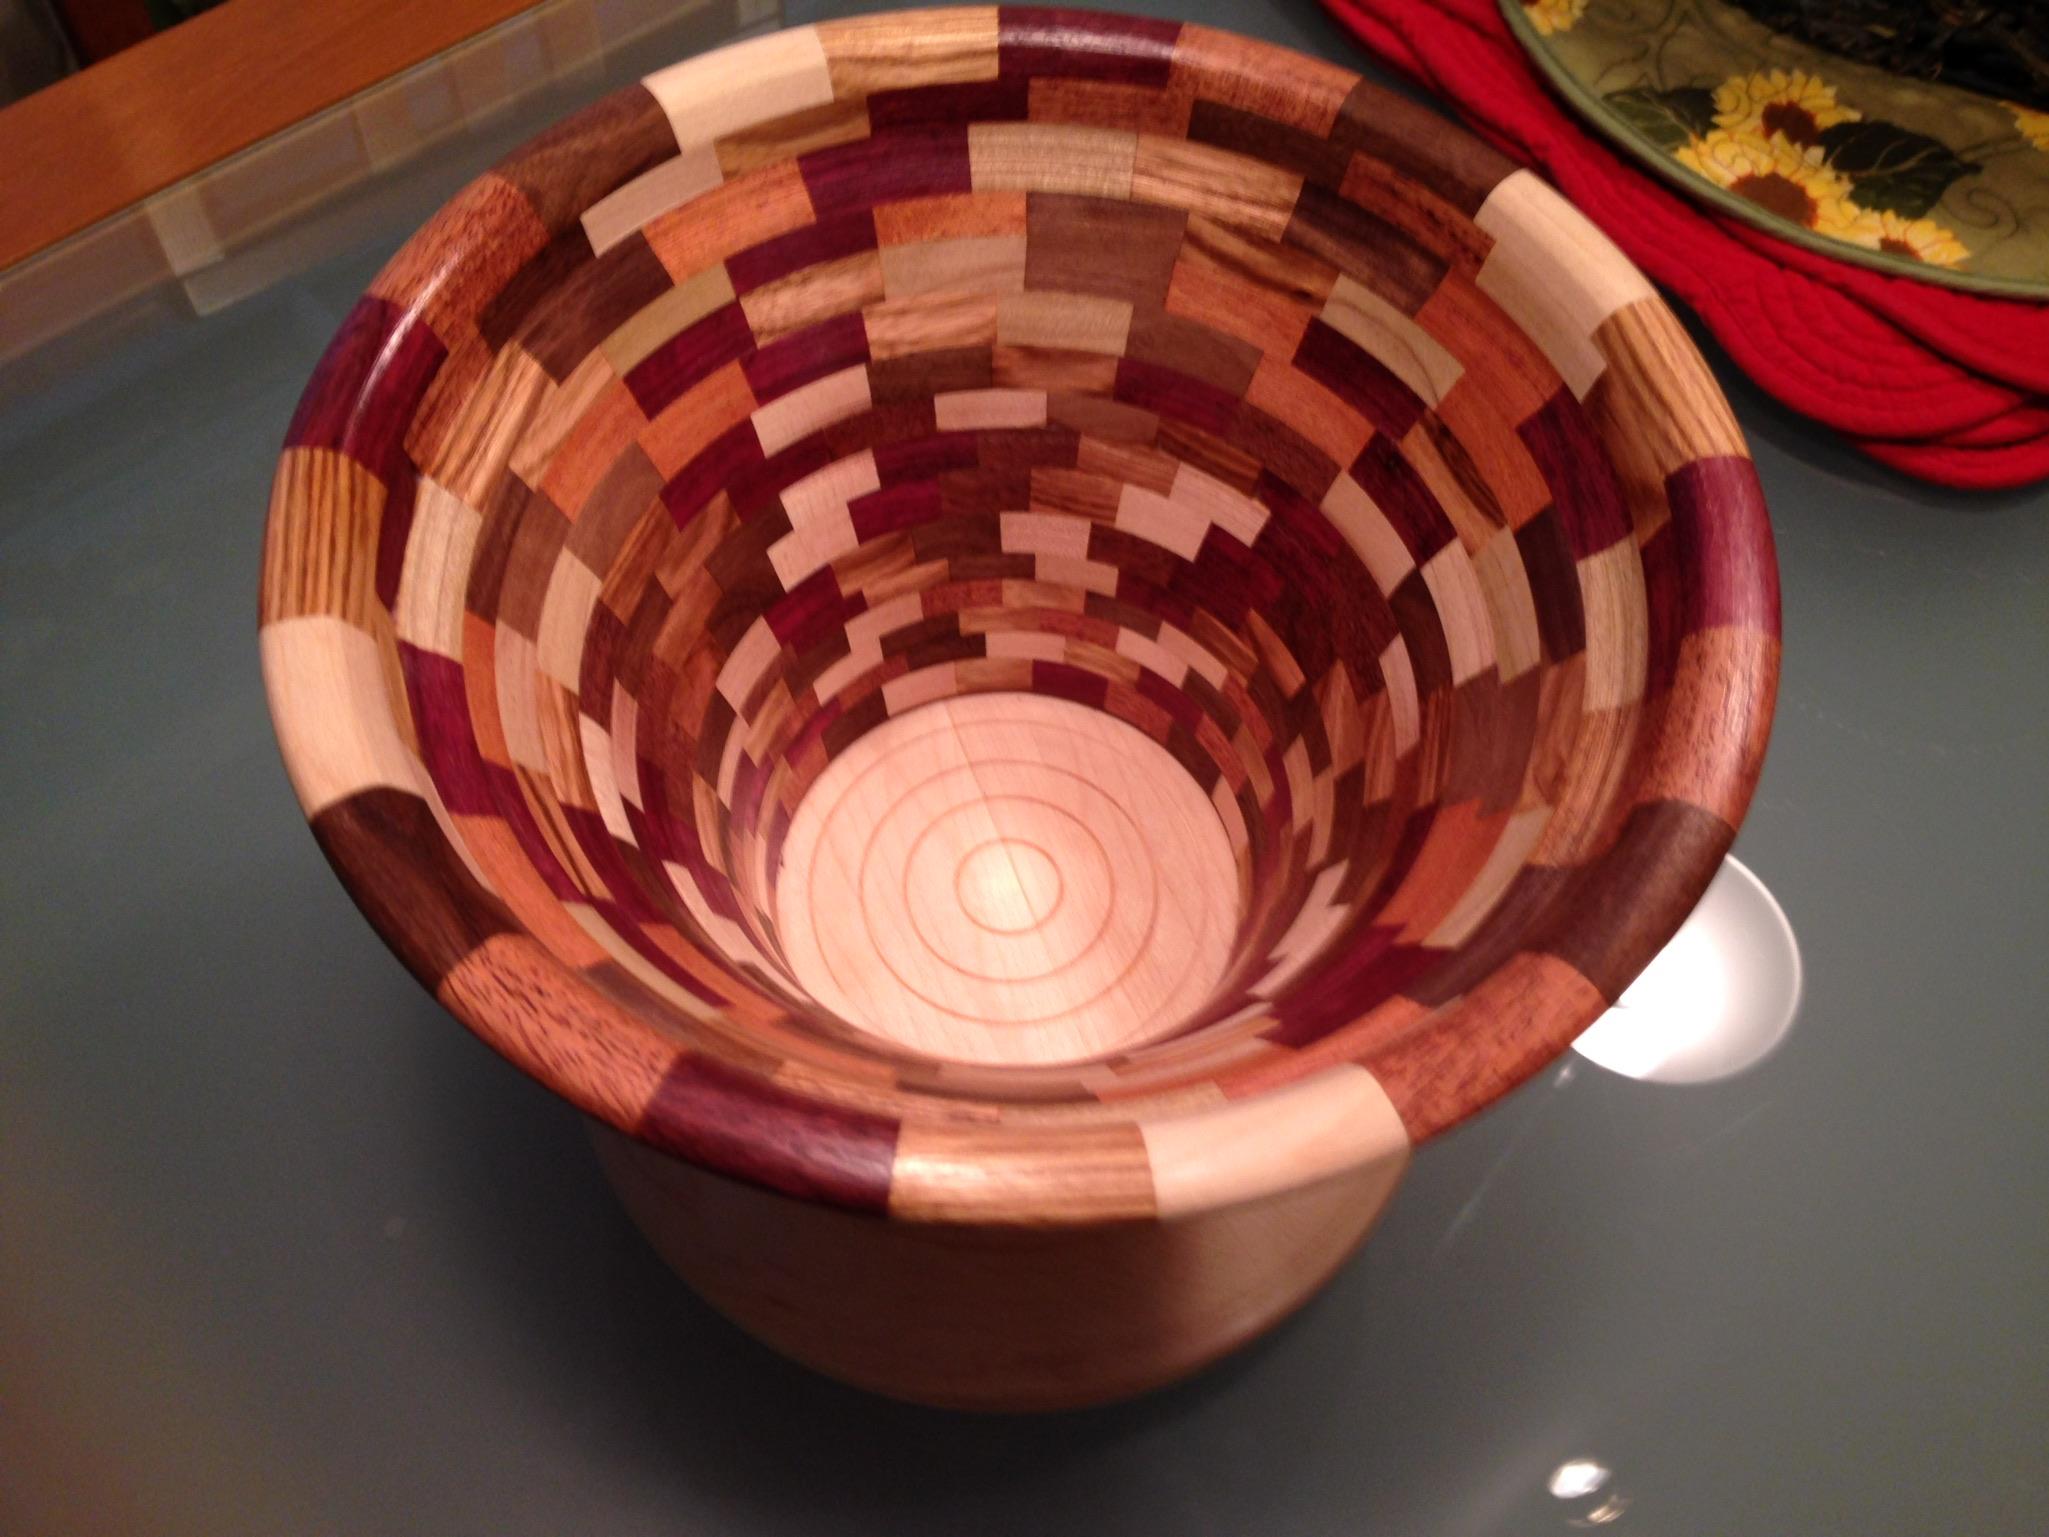 RJC Wood Creations - Bowls (62).jpg